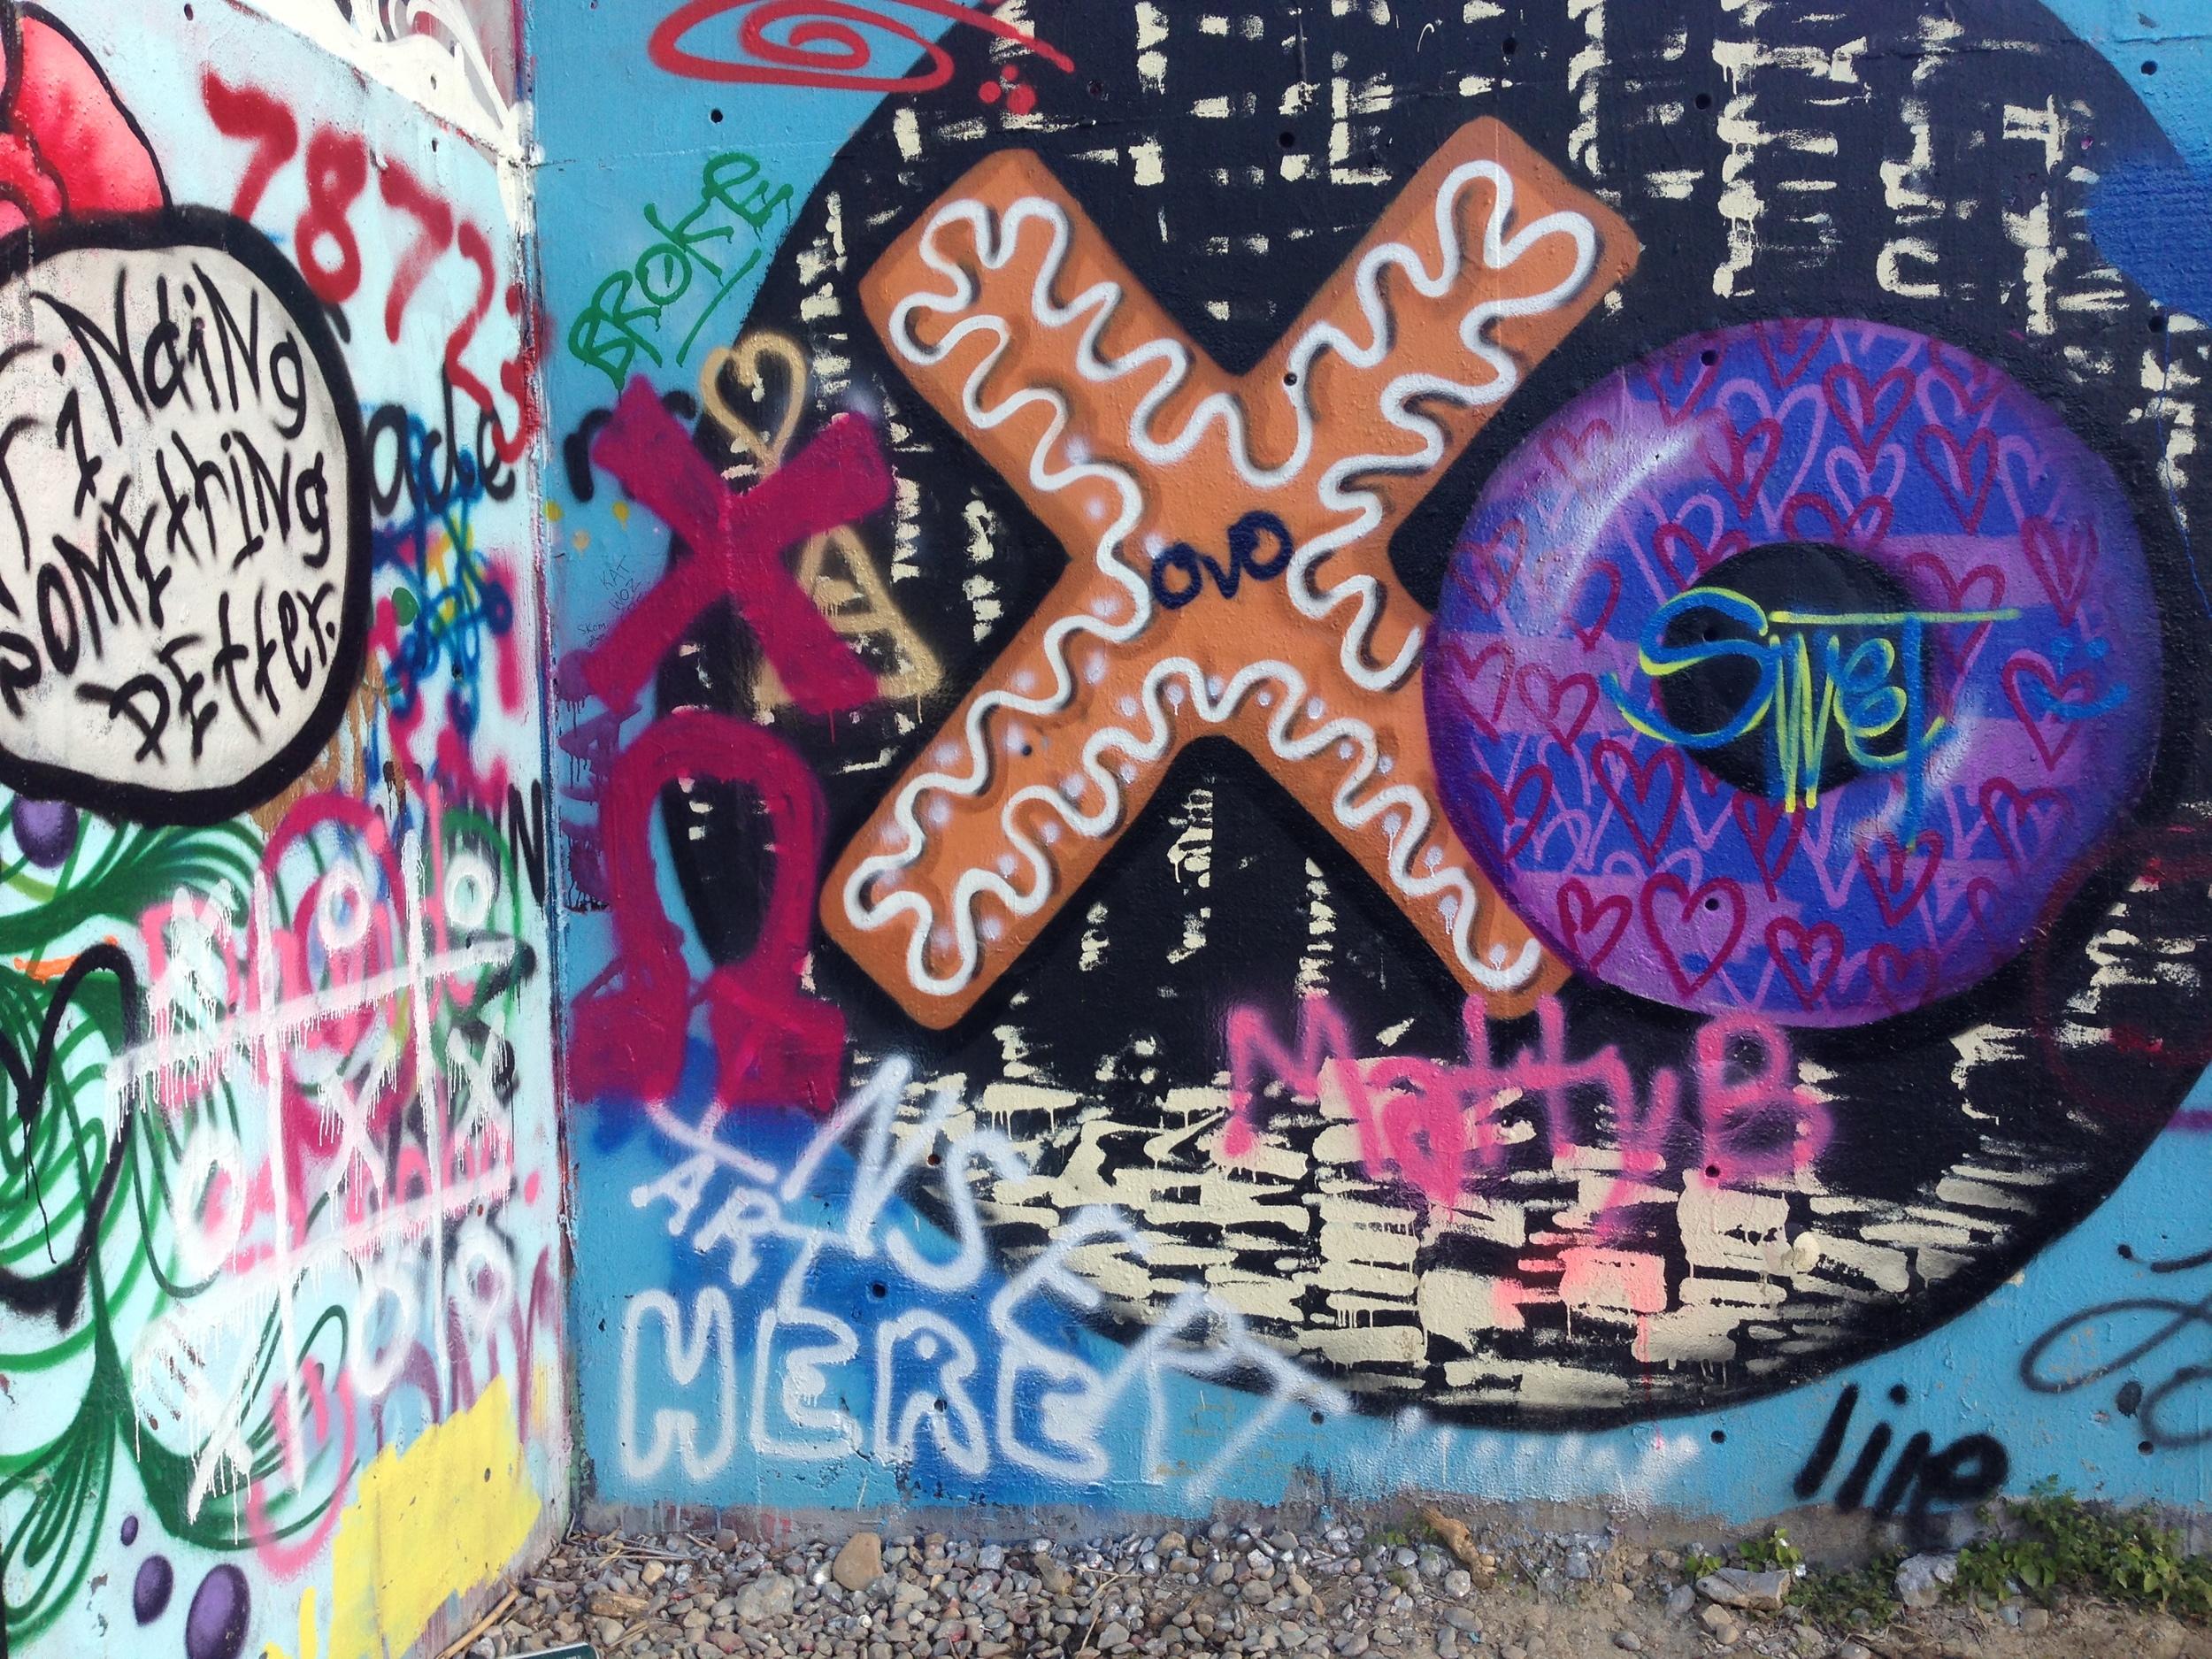 I love the idea of donuts so of course I love the donut graffiti